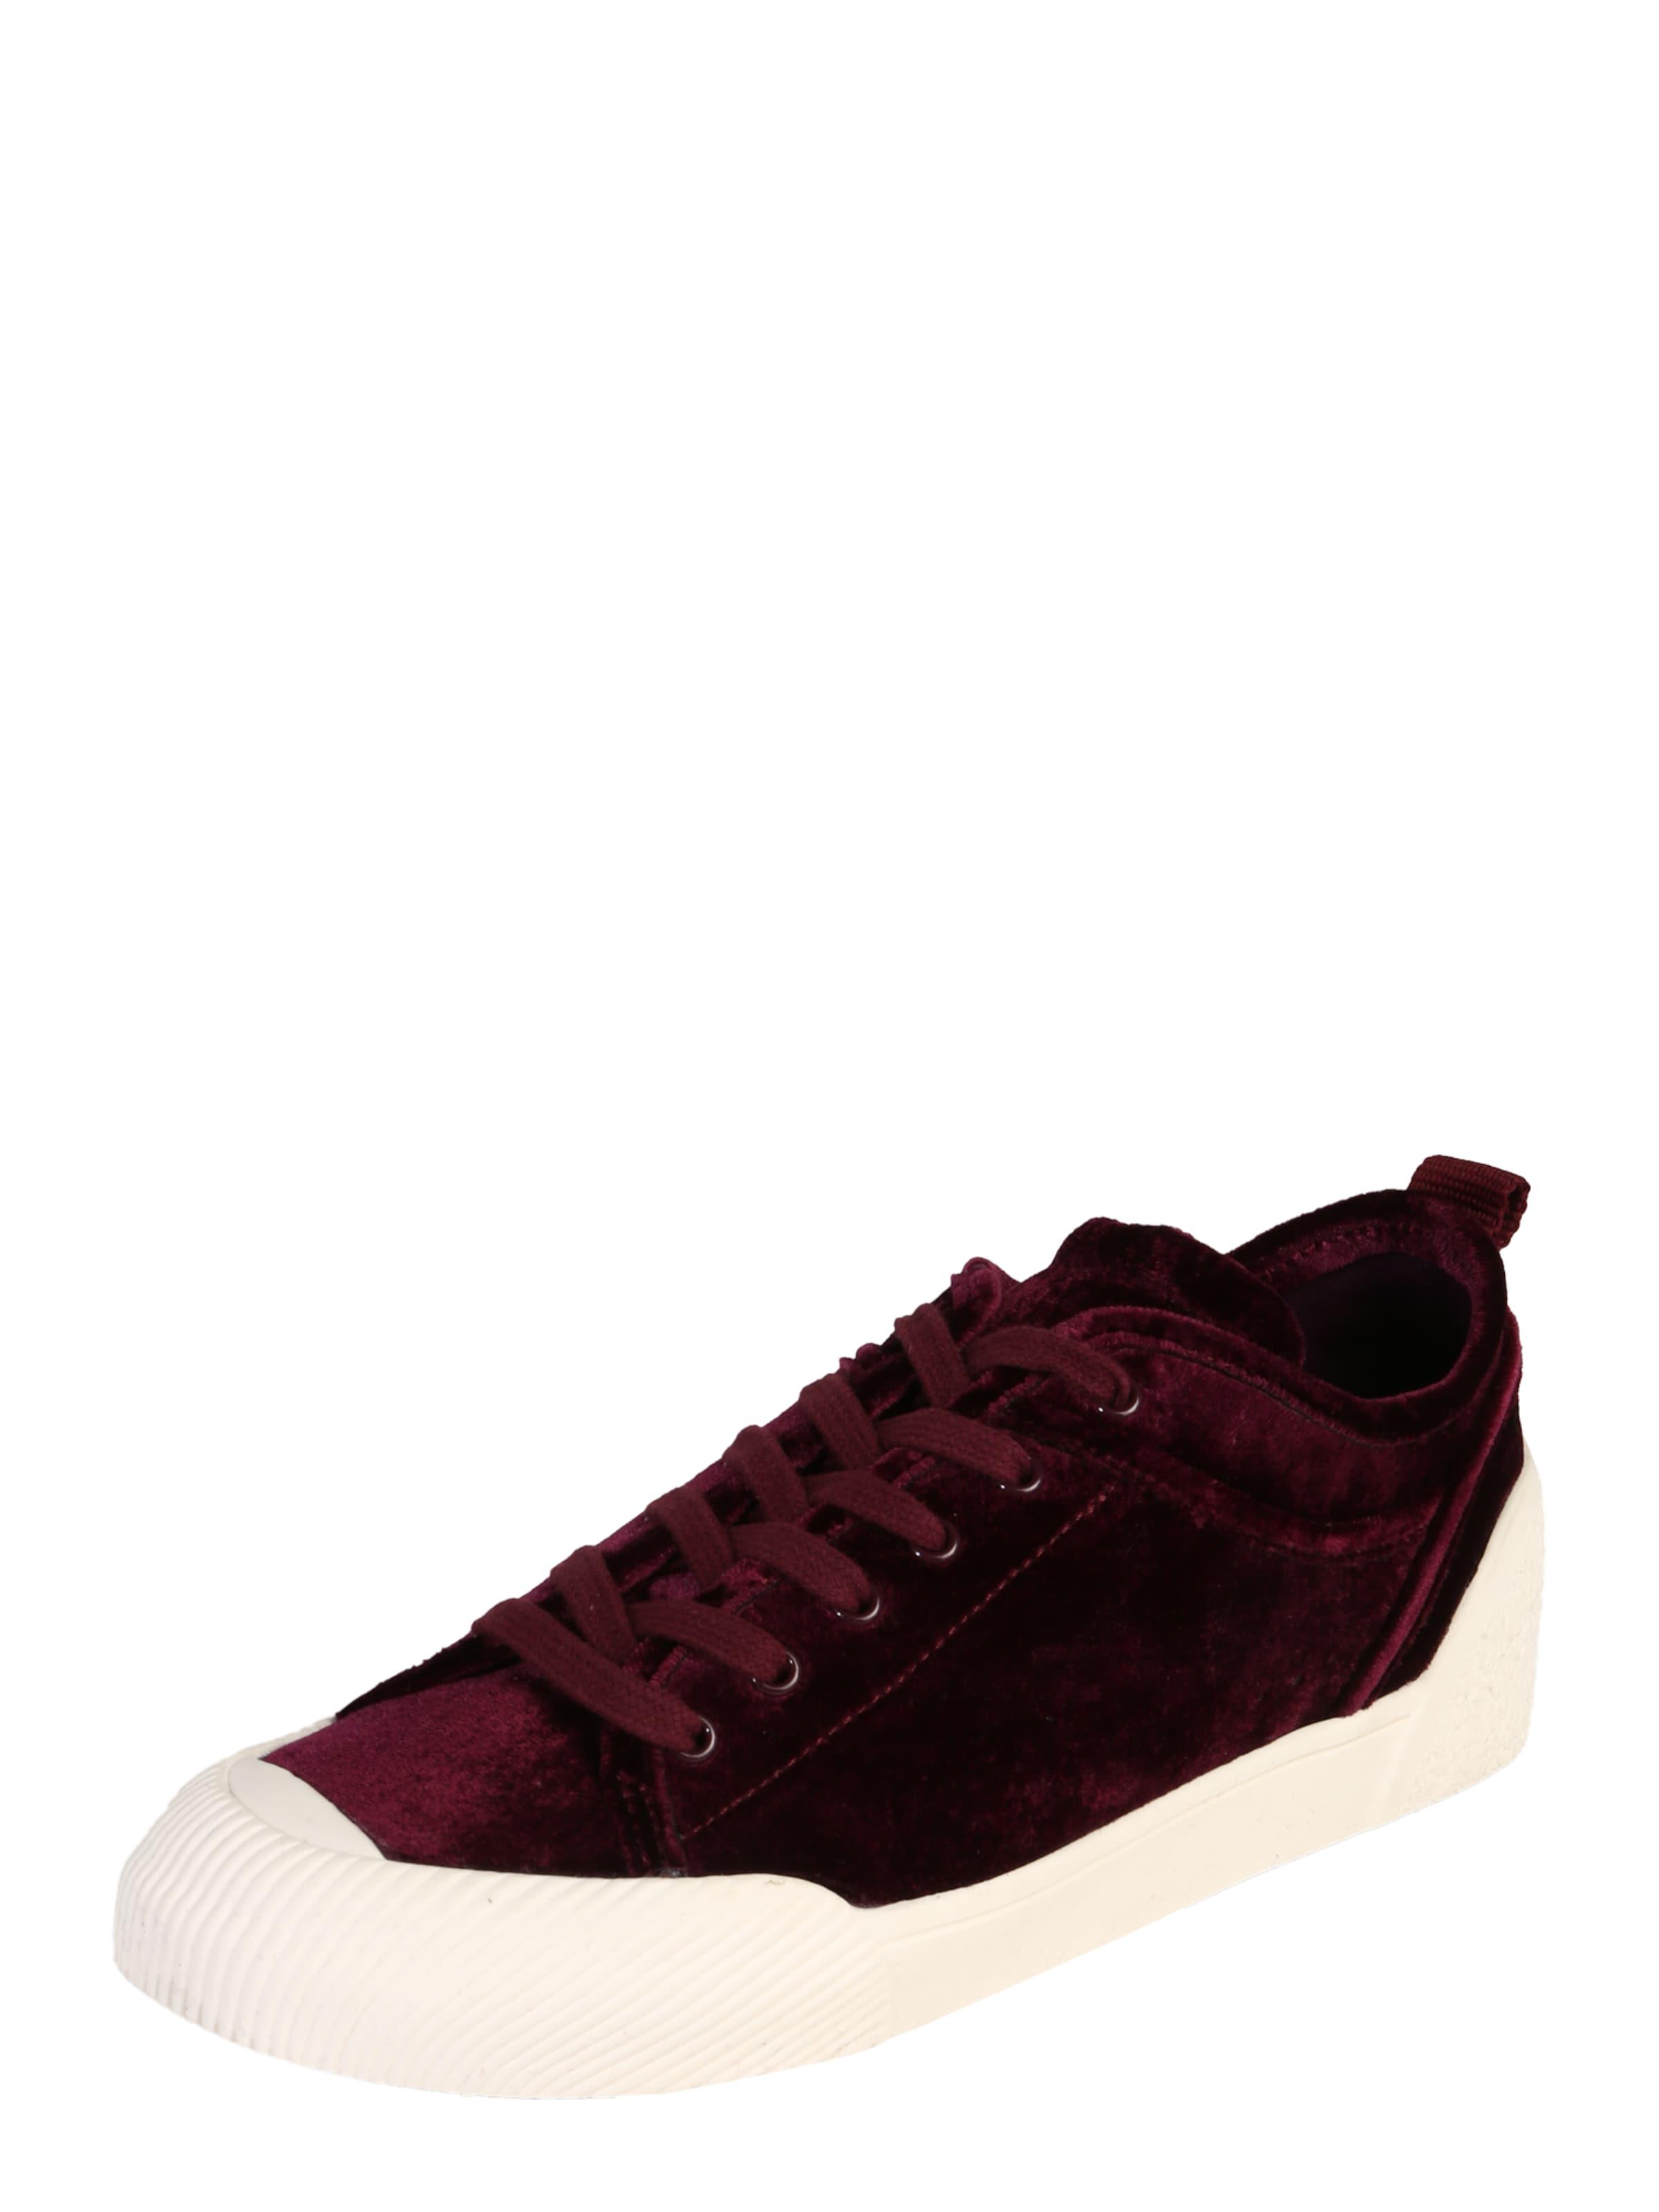 'Verena' Sneakers Sneakers 'Verena' Sneakers Sneakers 'Verena' ESPRIT ESPRIT Sneakers ESPRIT Sneakers ESPRIT ESPRIT 'Verena' 'Verena' 'Verena' ESPRIT vBUzxBp